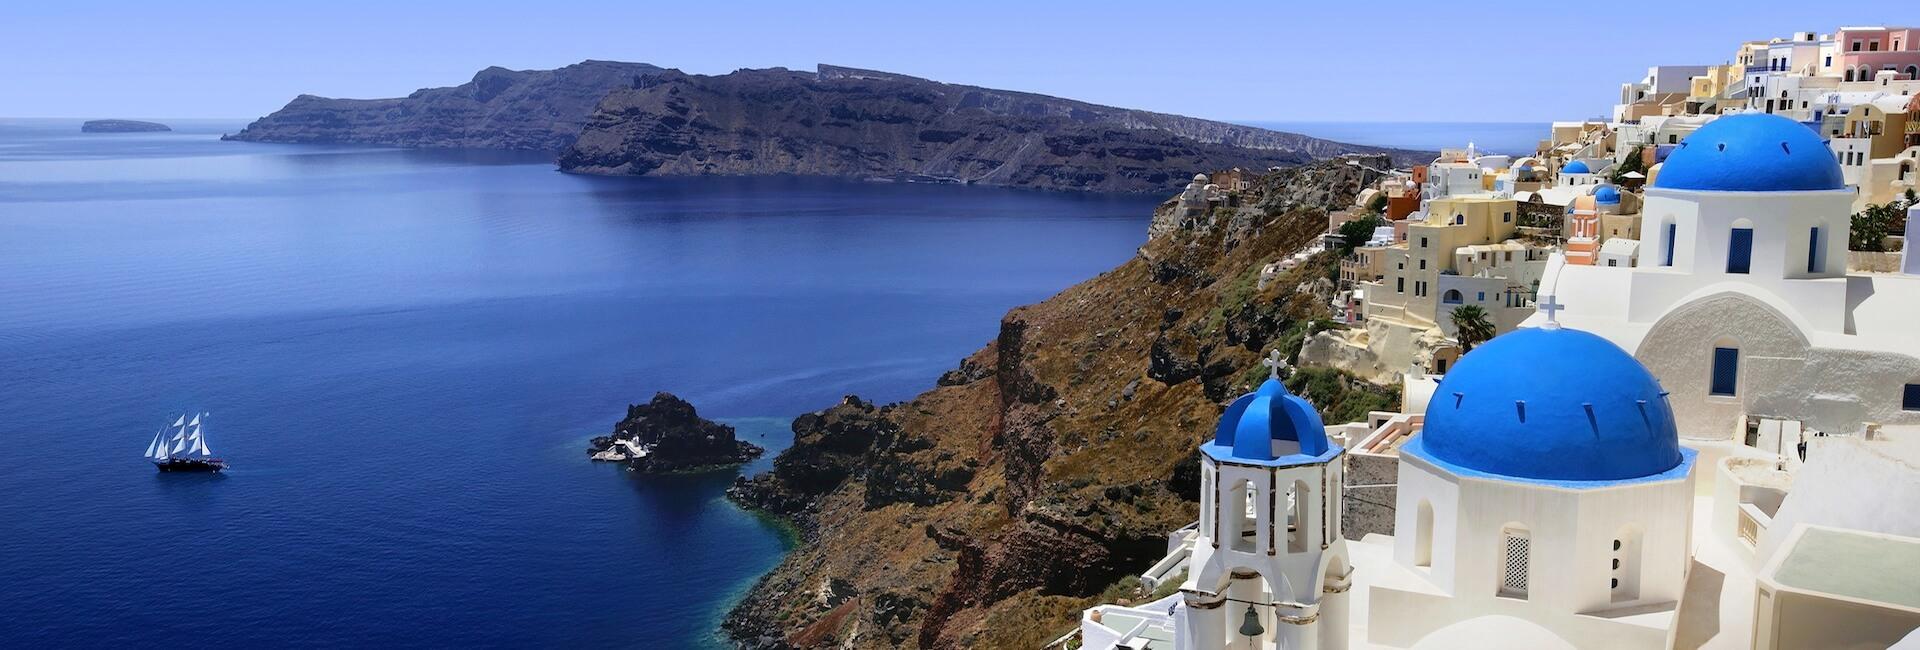 athens & greek island cruise